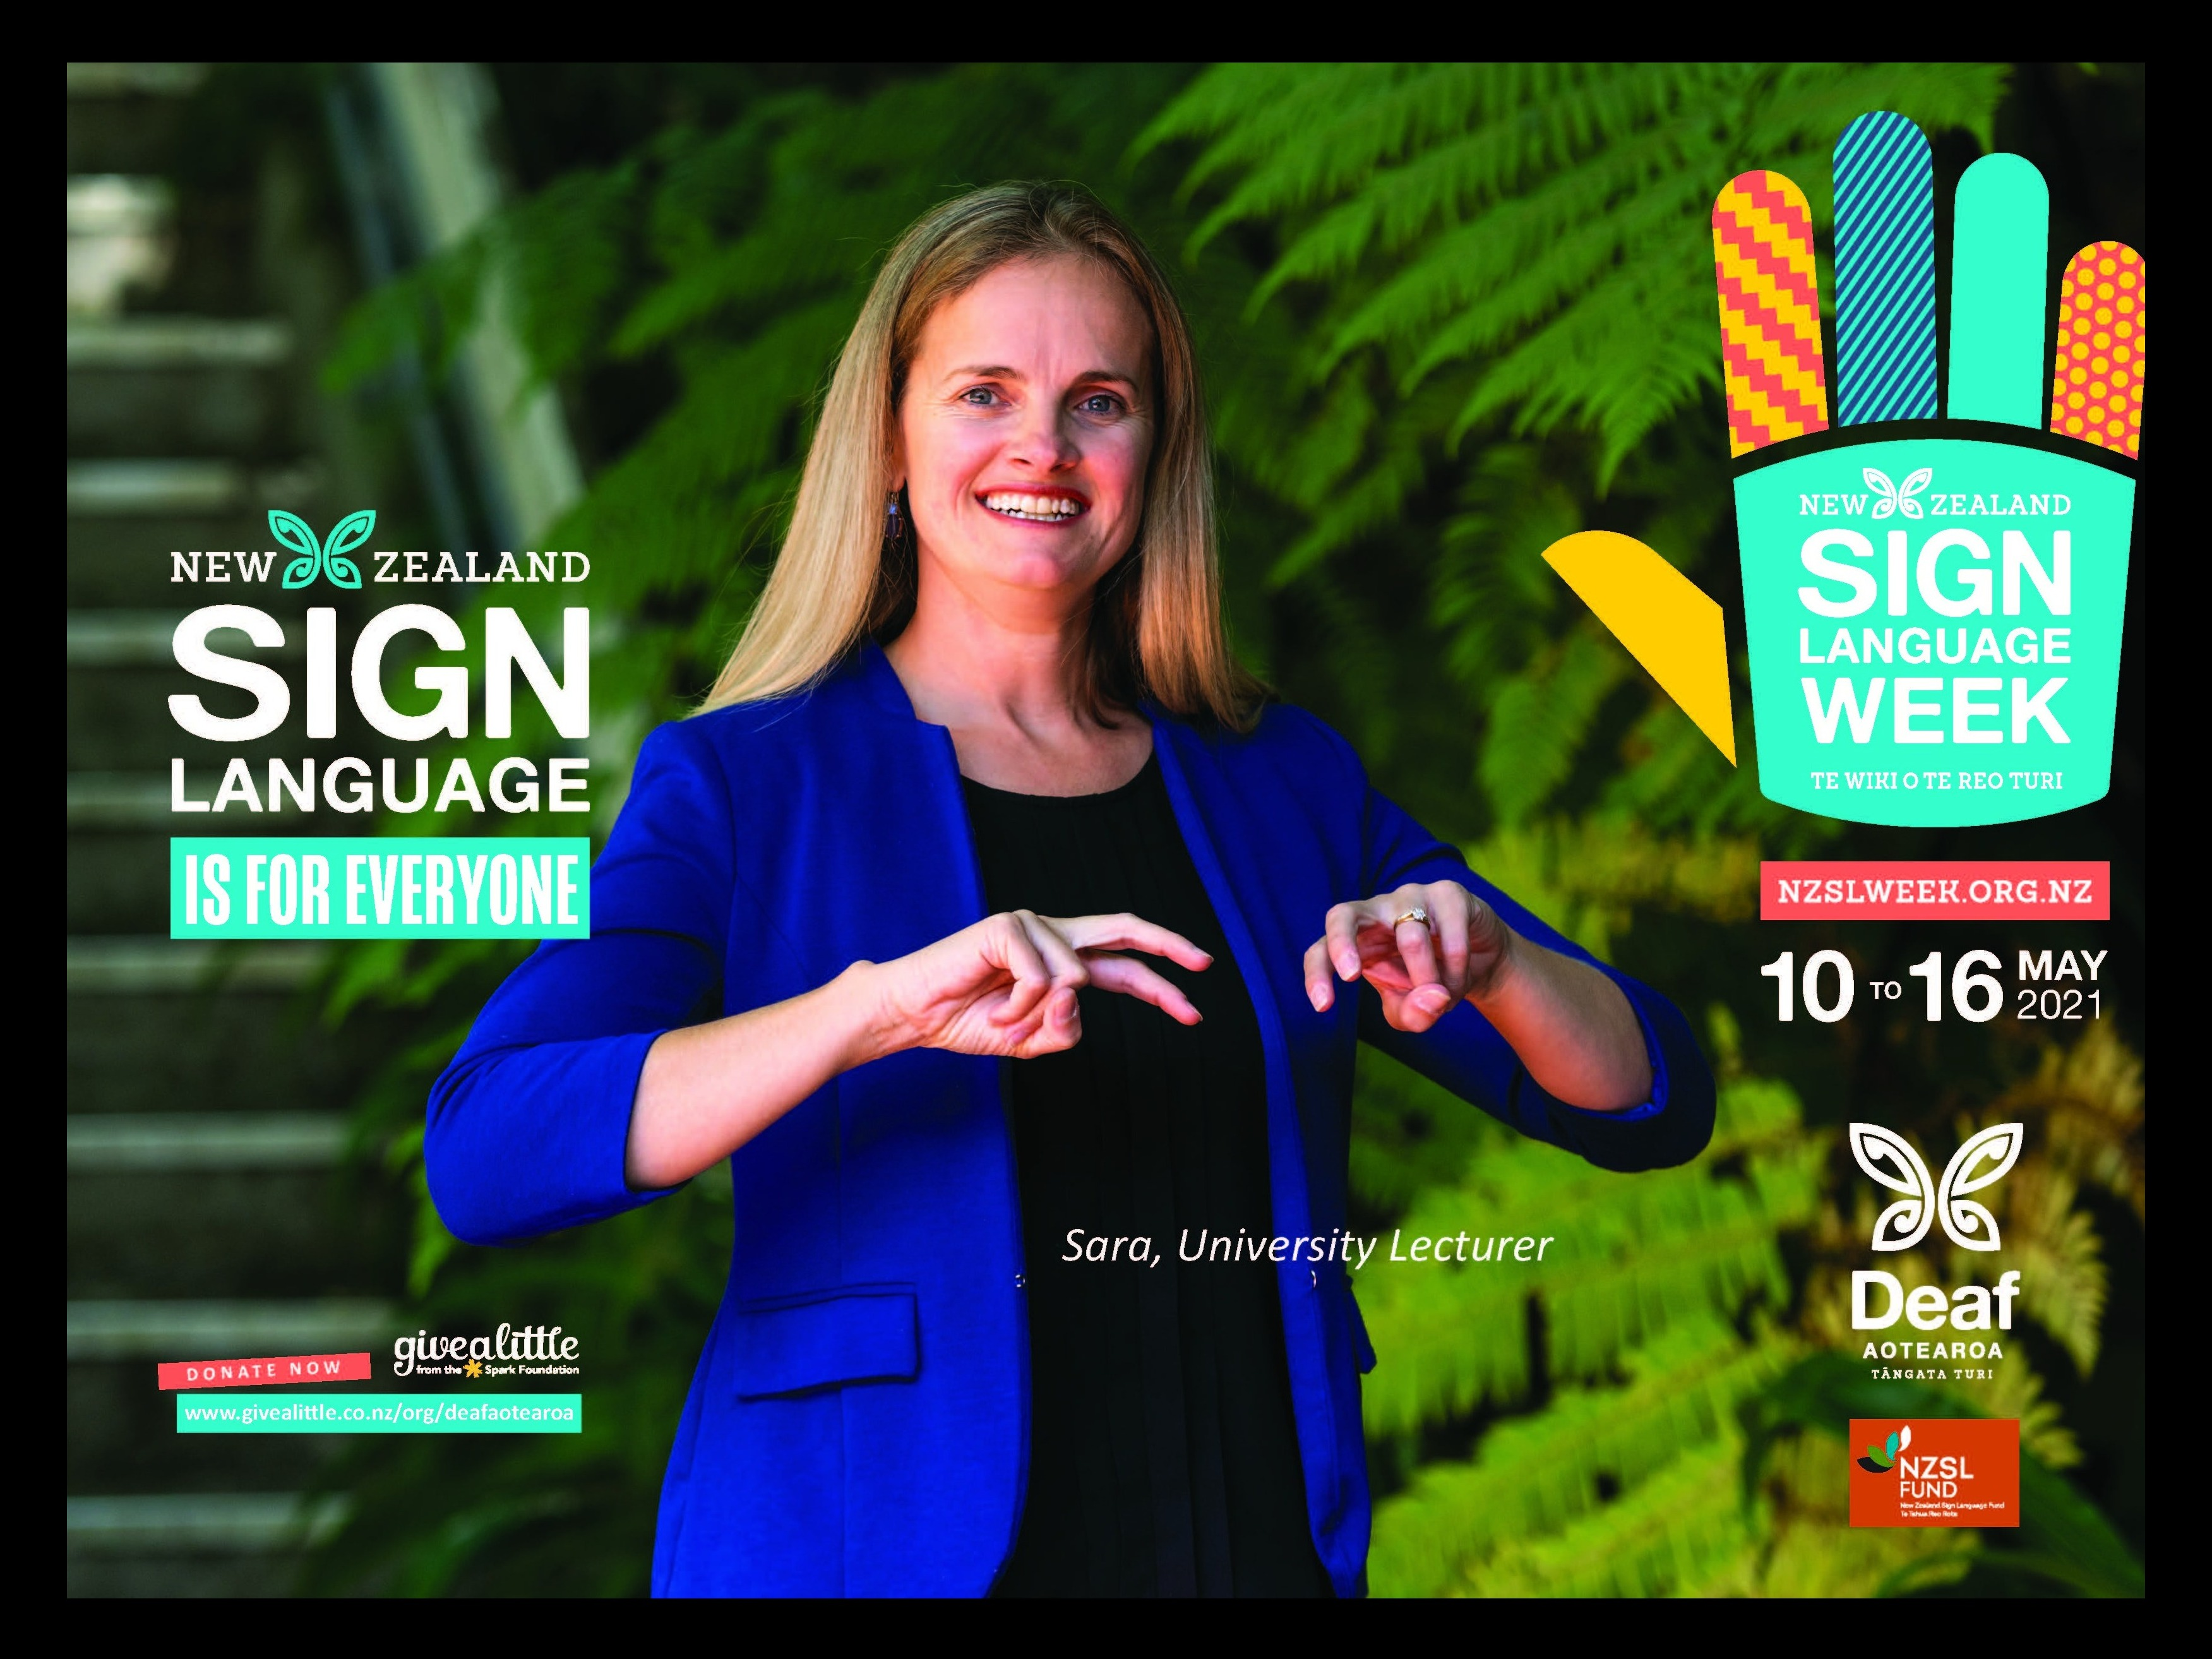 Flyer advertising NZSL week